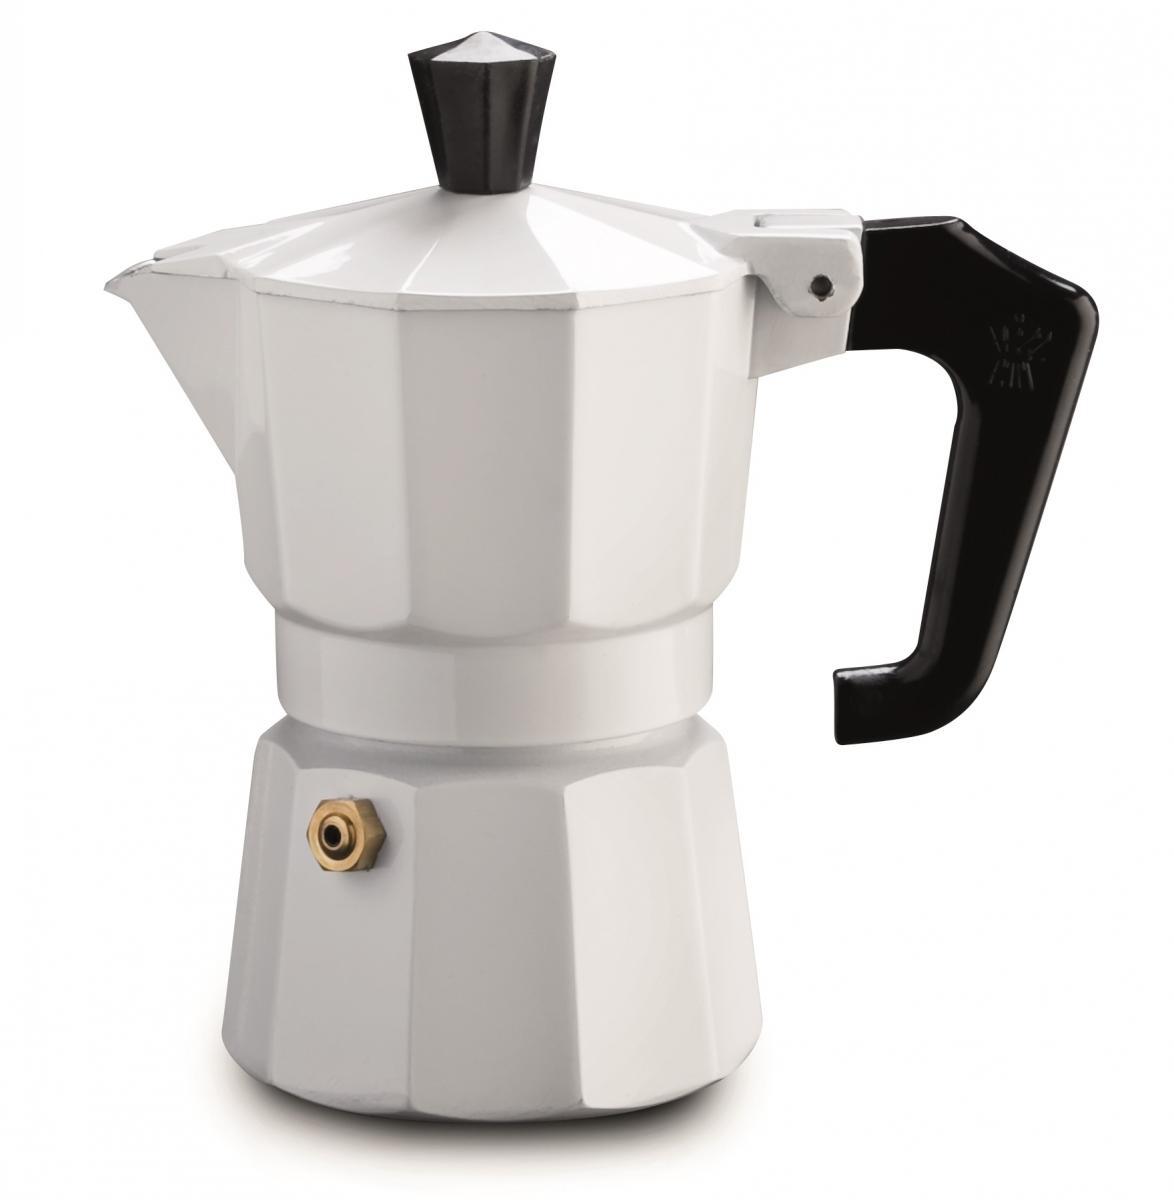 Pezzetti hliníkový kávovar Italexpress, 6 šálků - bílý